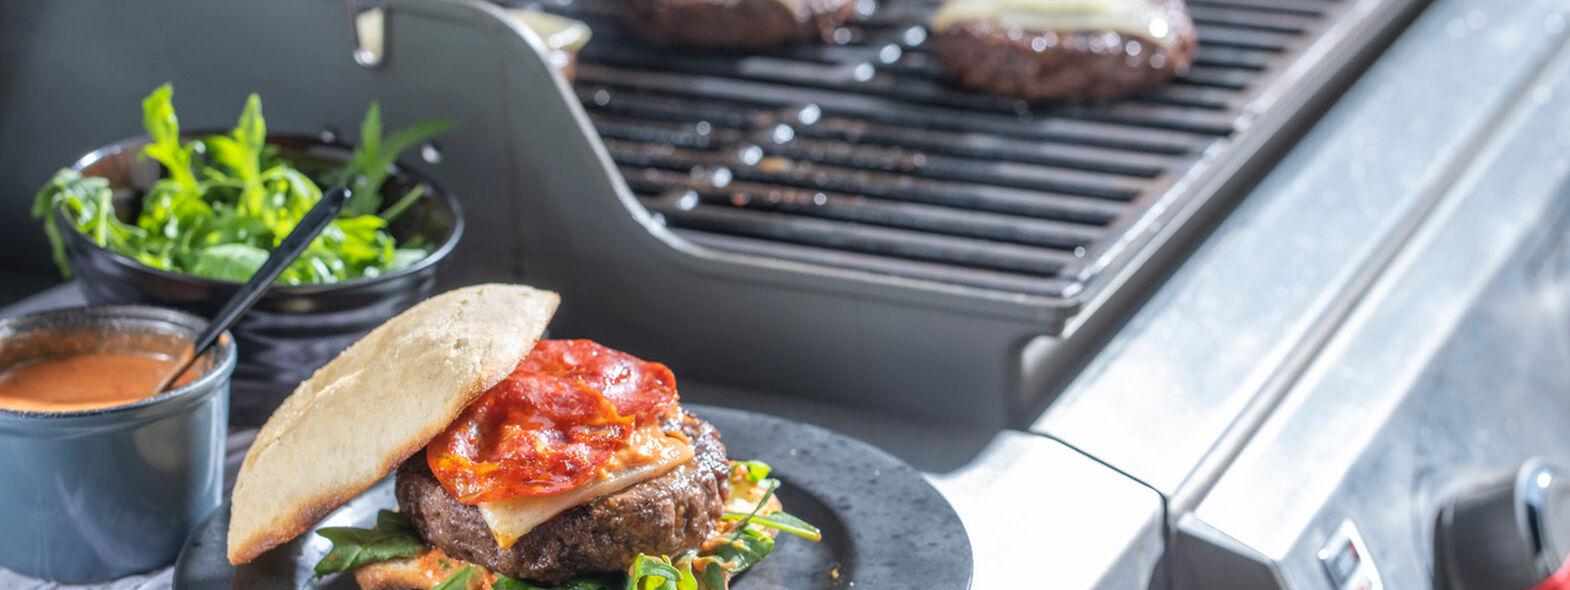 Steak & Burger 2020